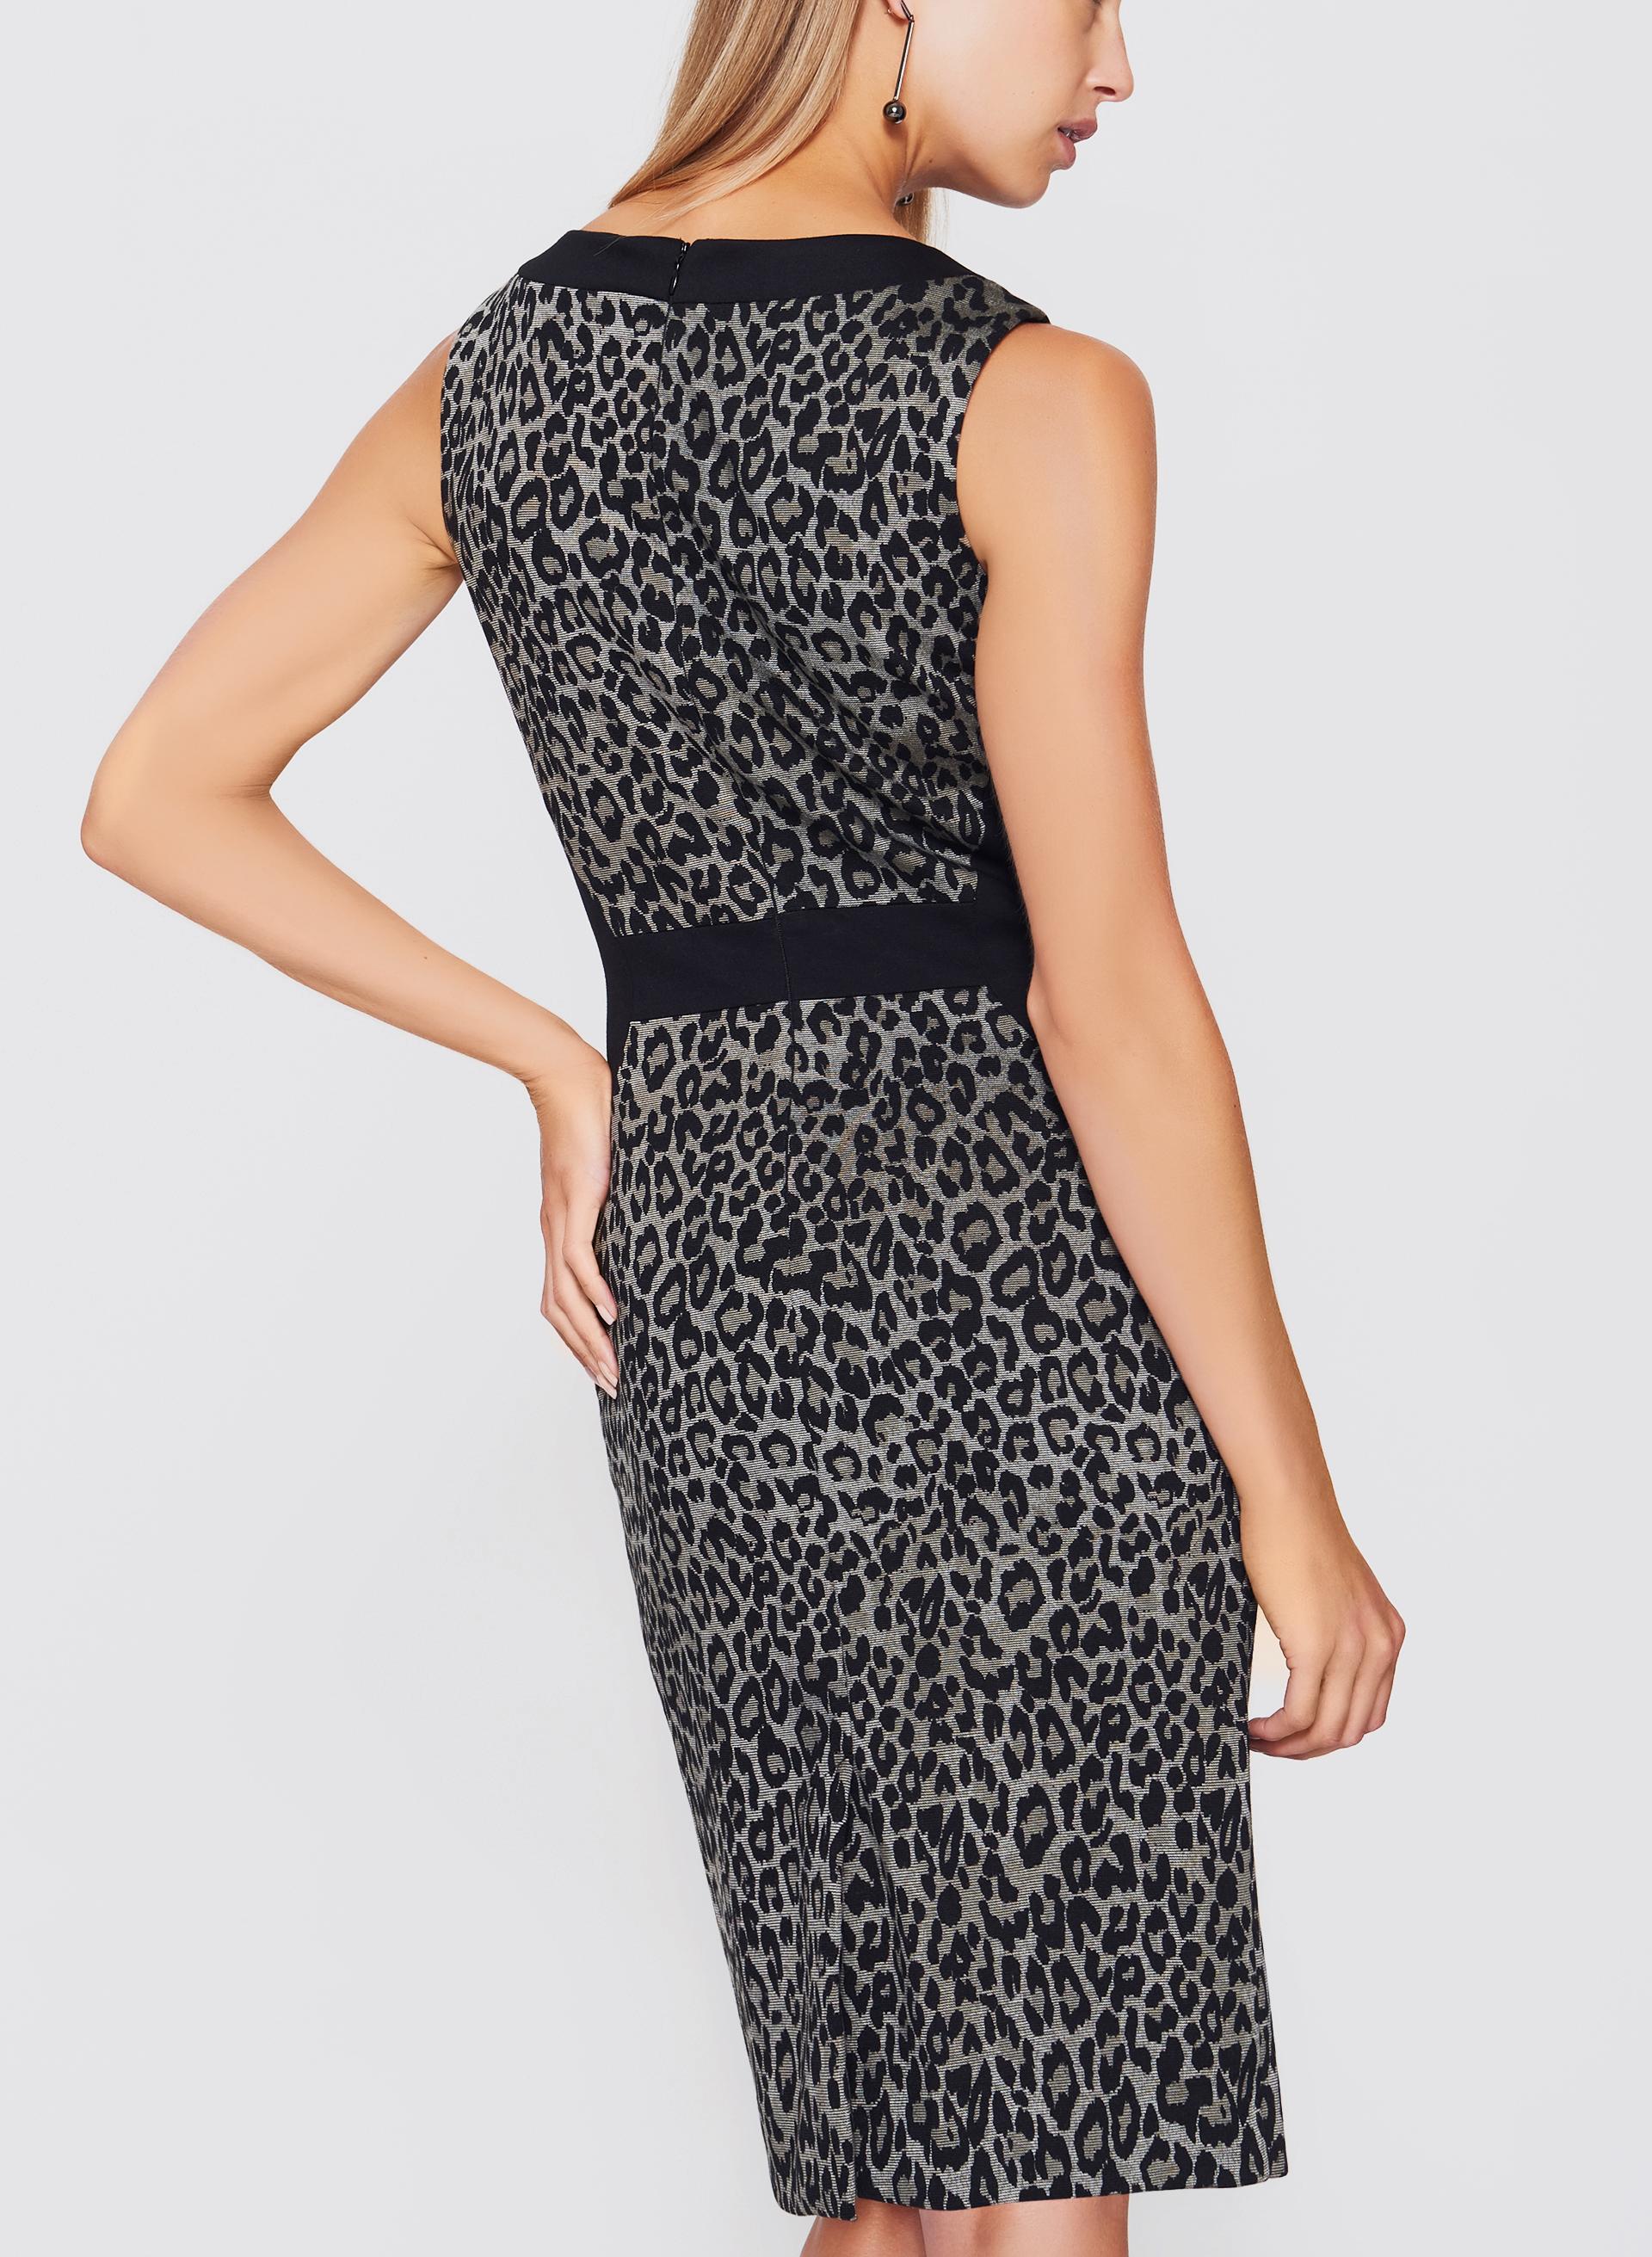 Leopard Print Sheath Dress Melanie Lyne